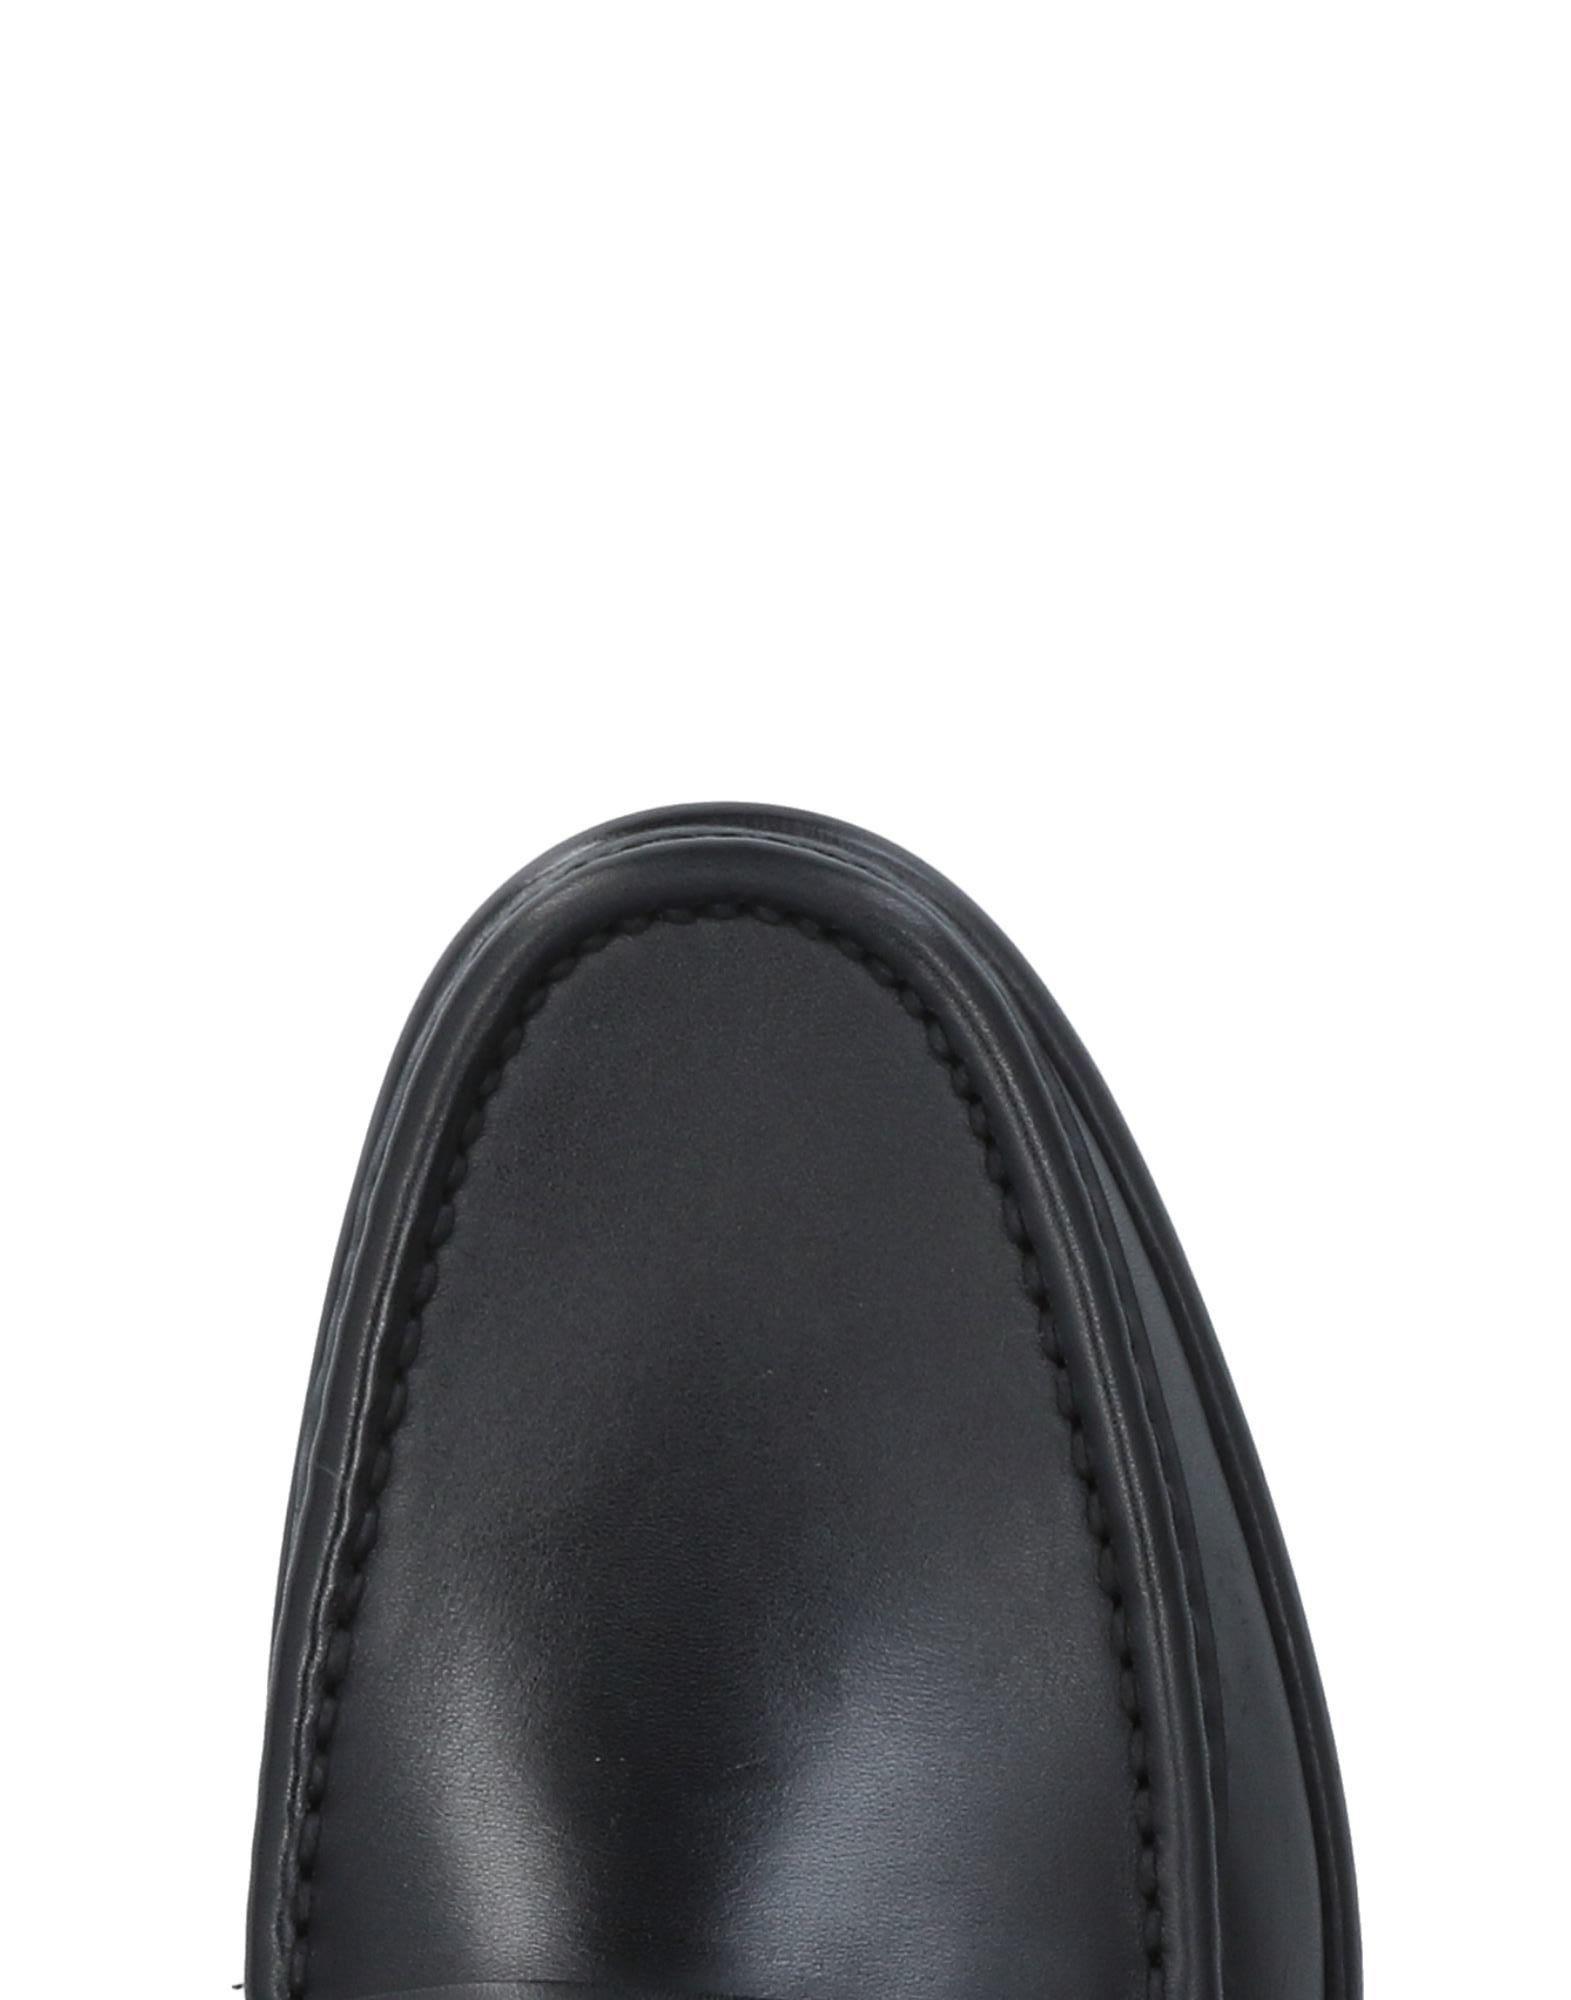 Bally Mokassins Herren beliebte  11475166TH Gute Qualität beliebte Herren Schuhe 51e96f